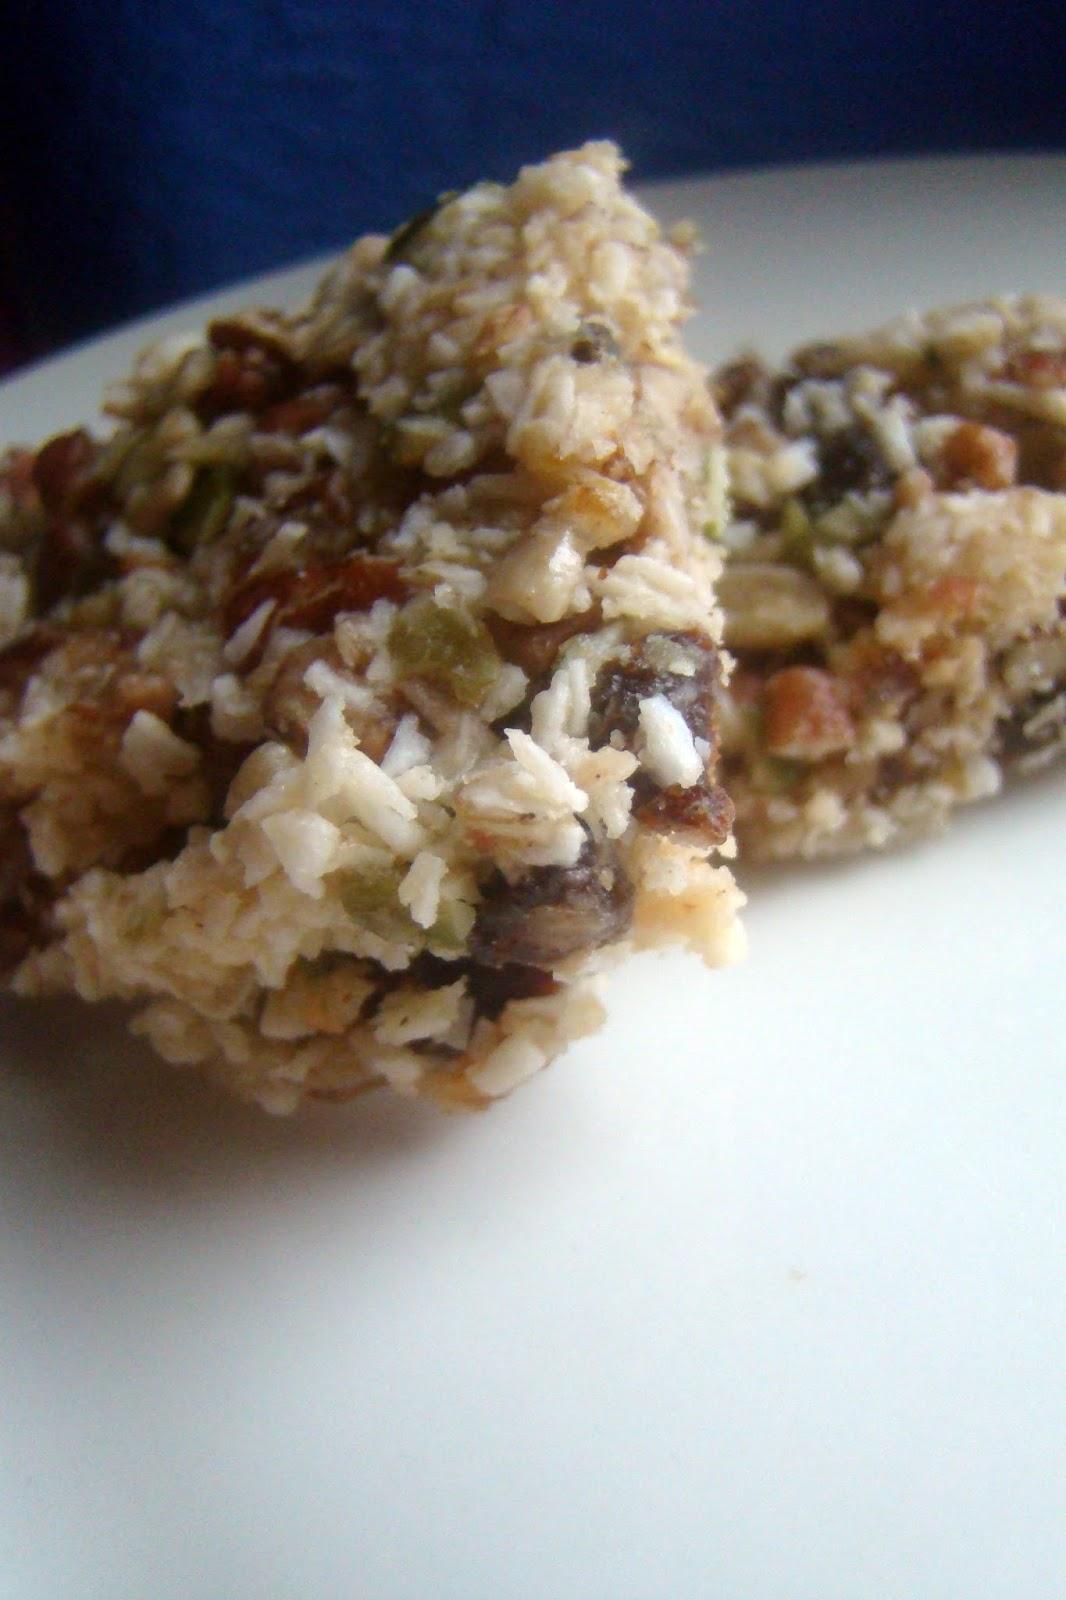 Nourished and NurturedFruit and Nut Power Bars (Primal GAPS